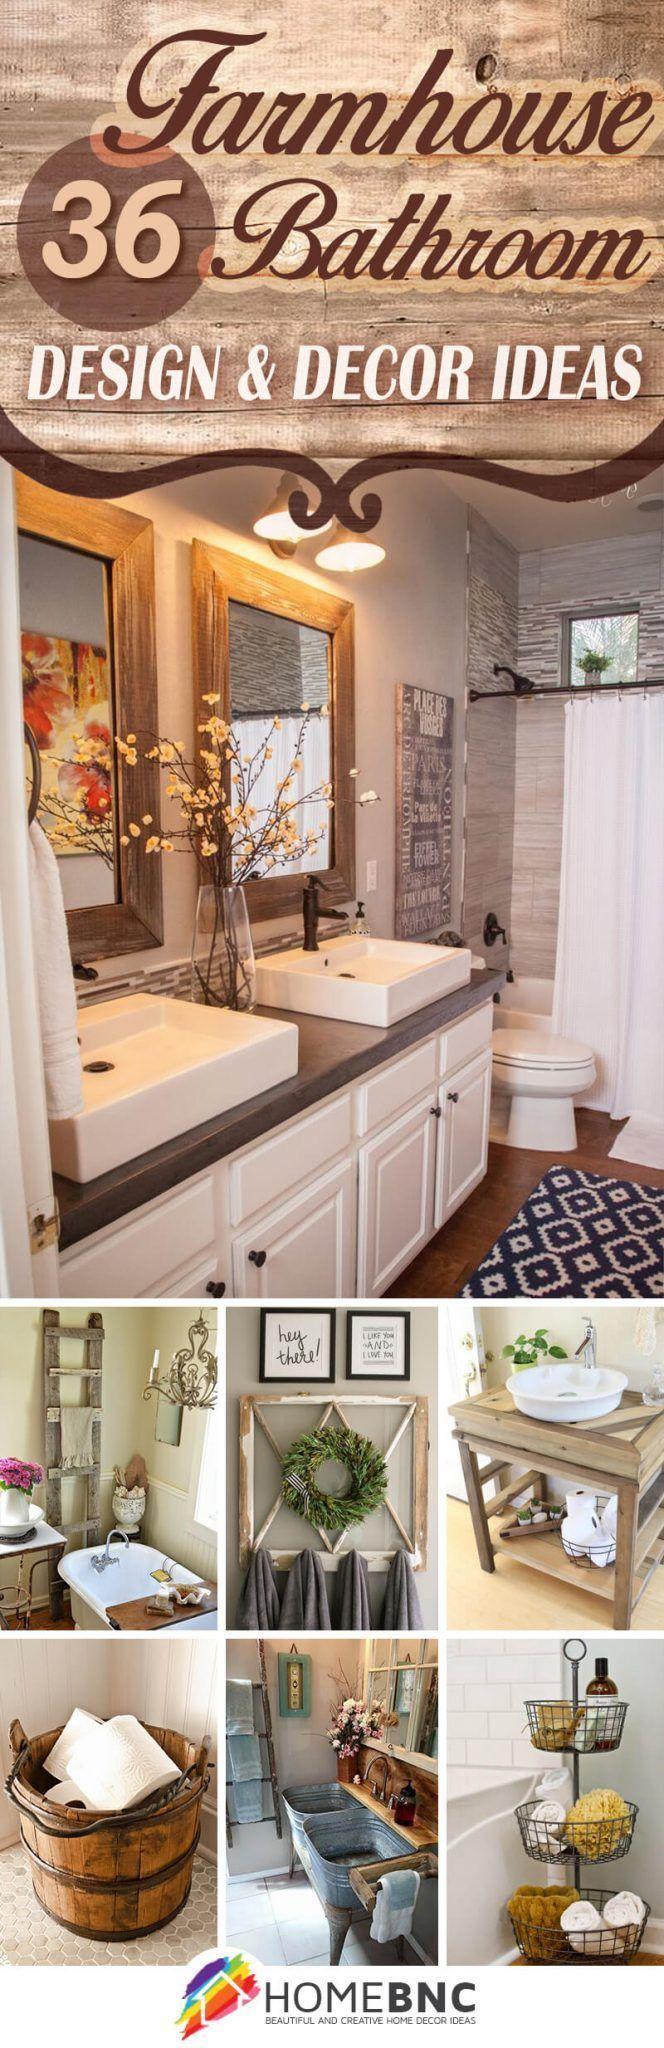 Farmhouse Bathroom Decor Ideas (scheduled via http://www.tailwindapp.com?utm_source=pinterest&utm_medium=twpin)